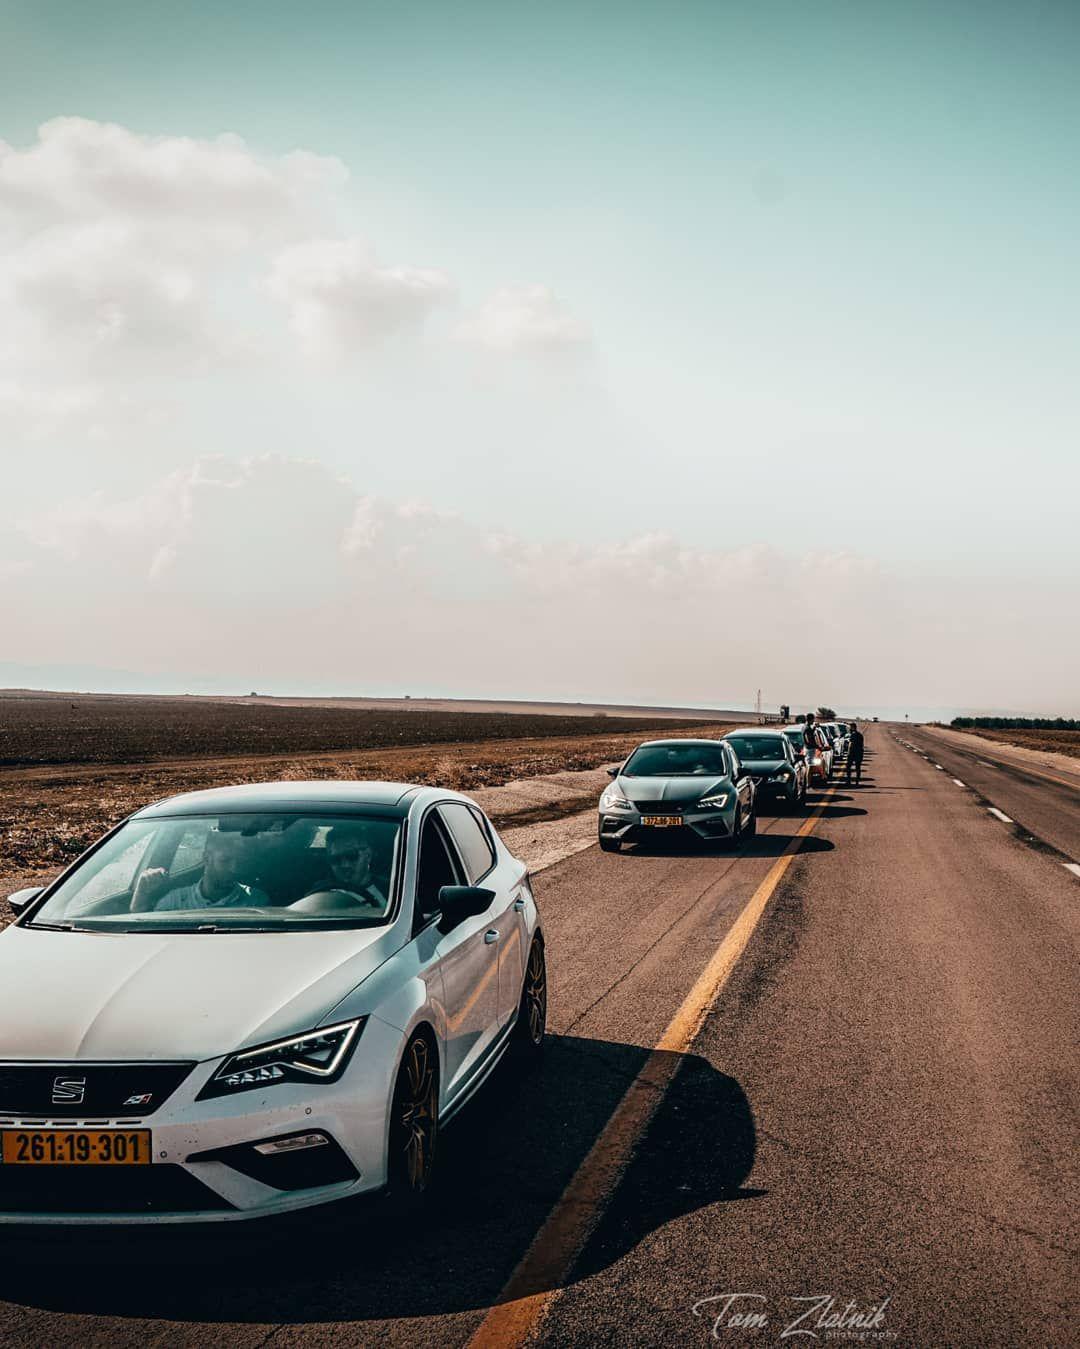 Israeli Vag Autoclub By Tomzlatnik Vw Audi Seat Skoda Car Passion Race Drive Enjoy Worldwide Car With Images Super Cars Mercedes Petrolhead